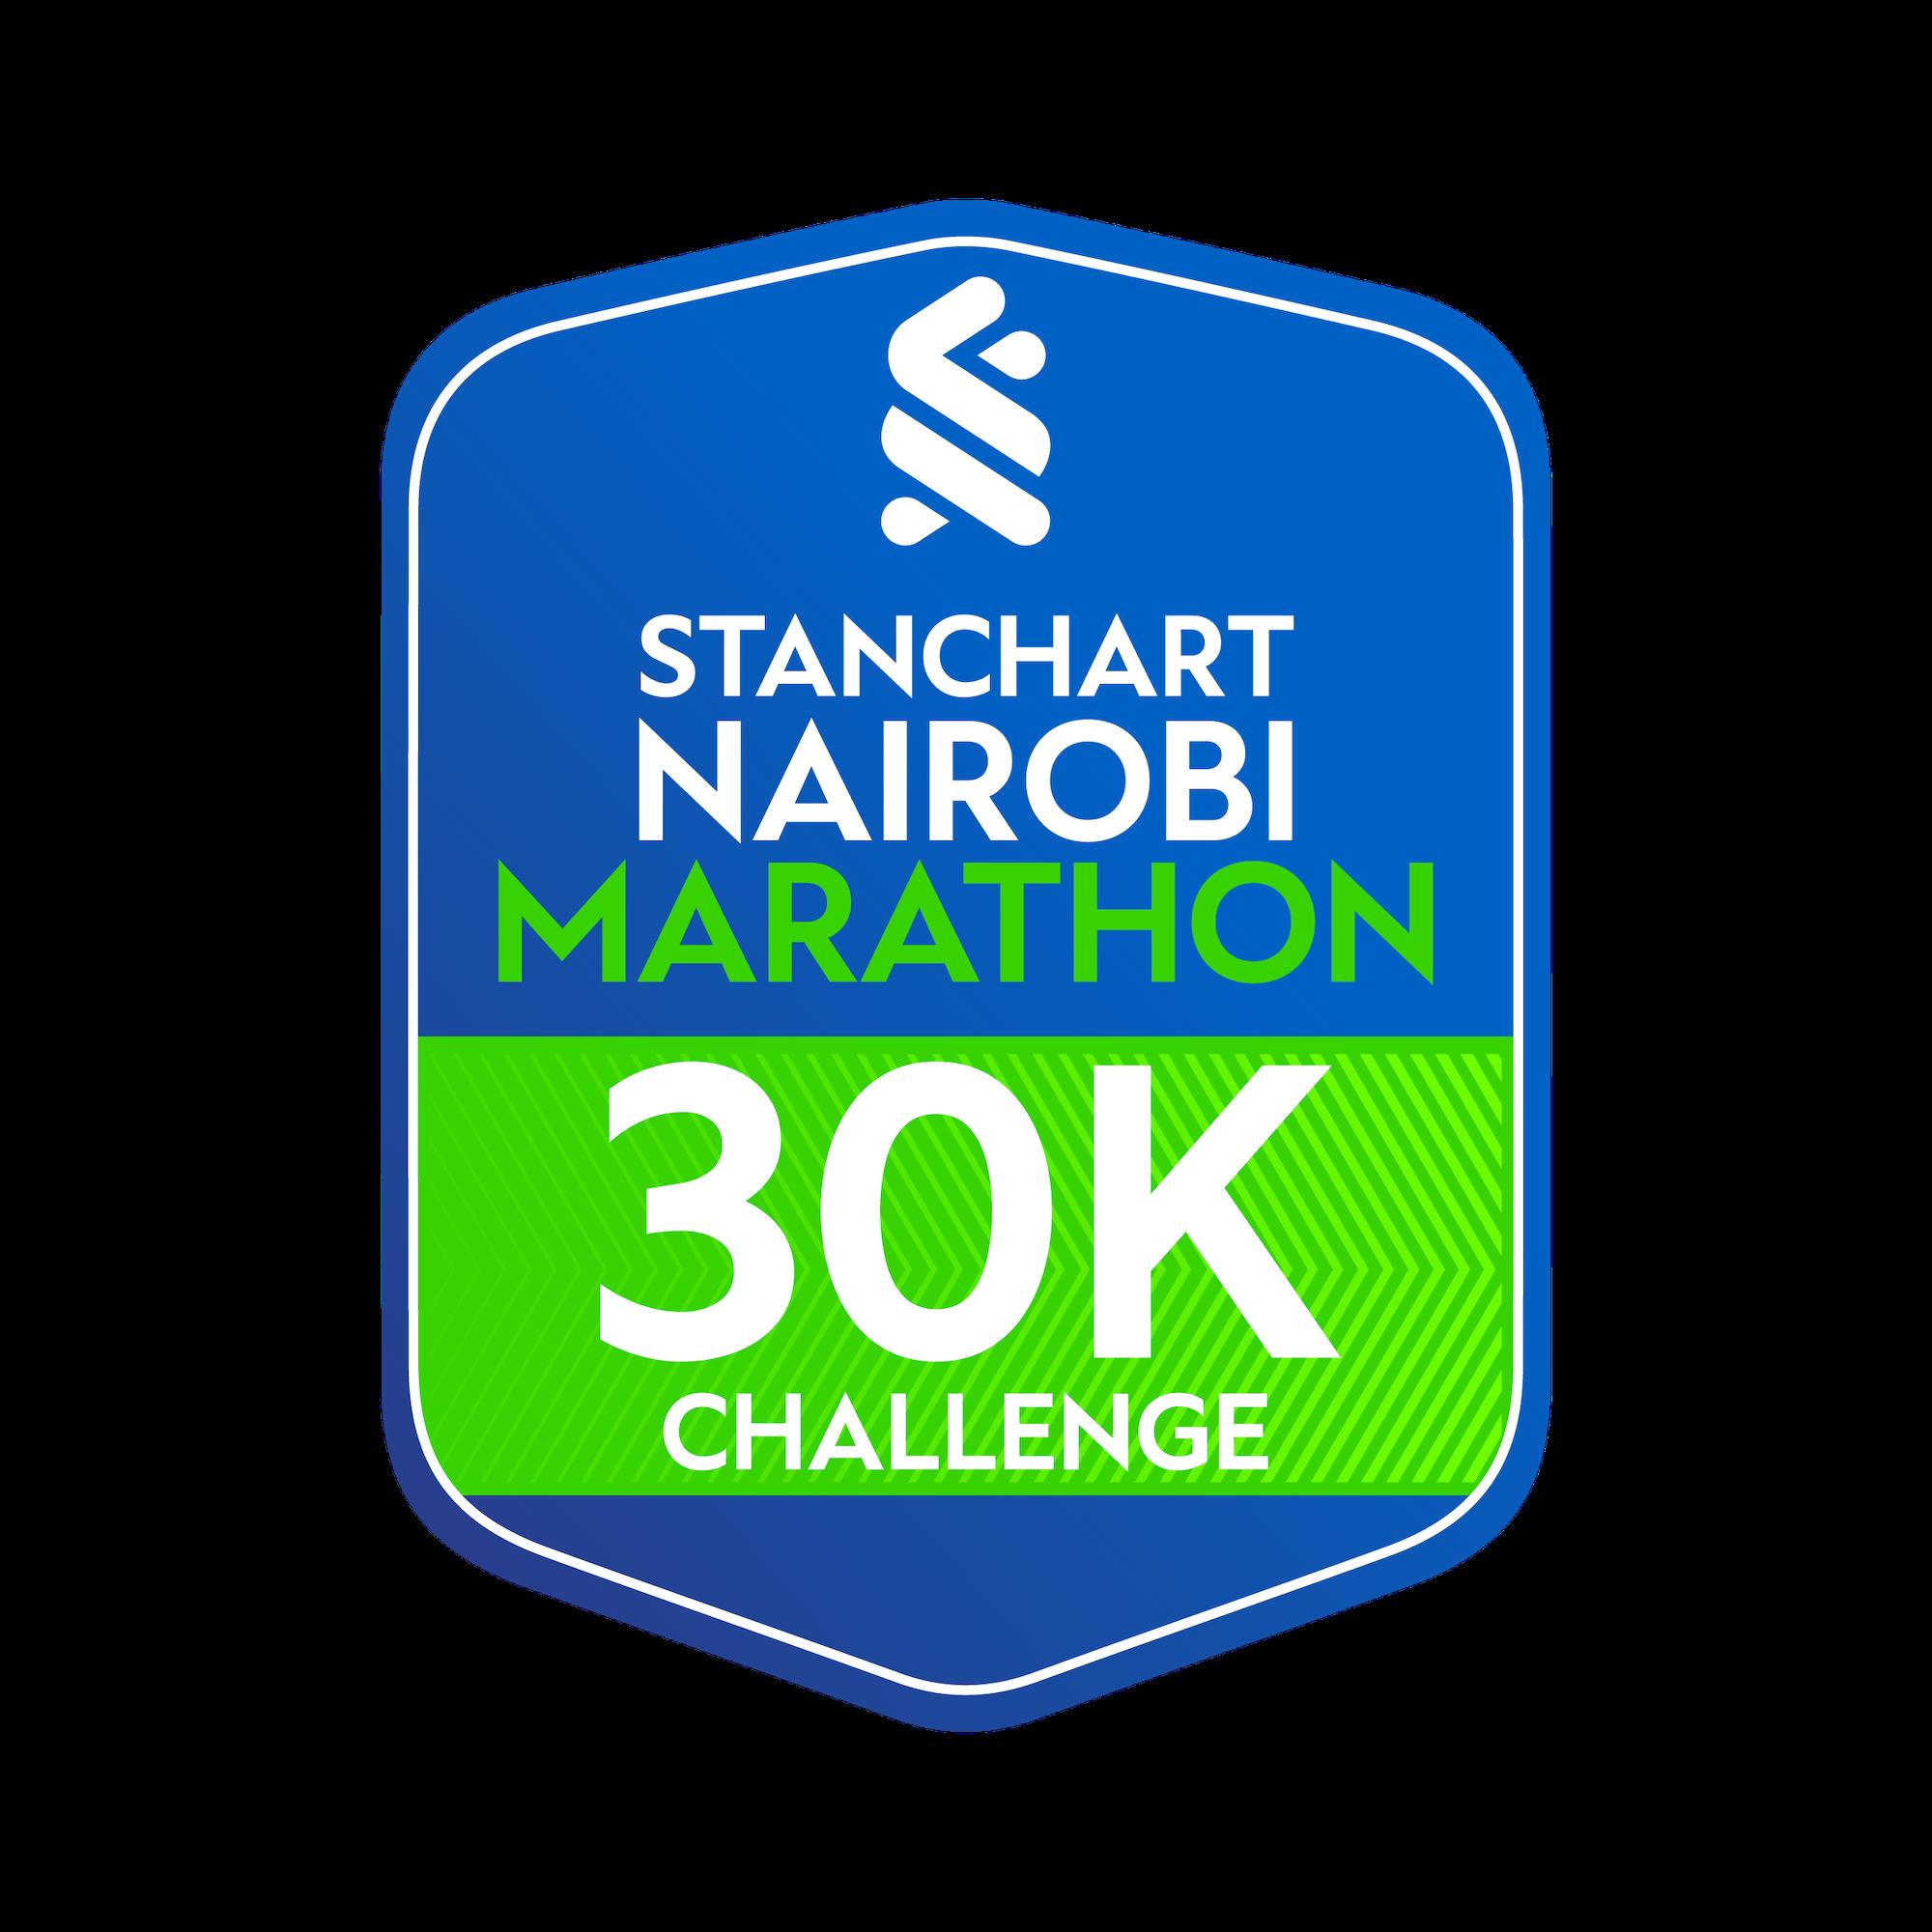 StanChart Nairobi Marathon 30k Challenge